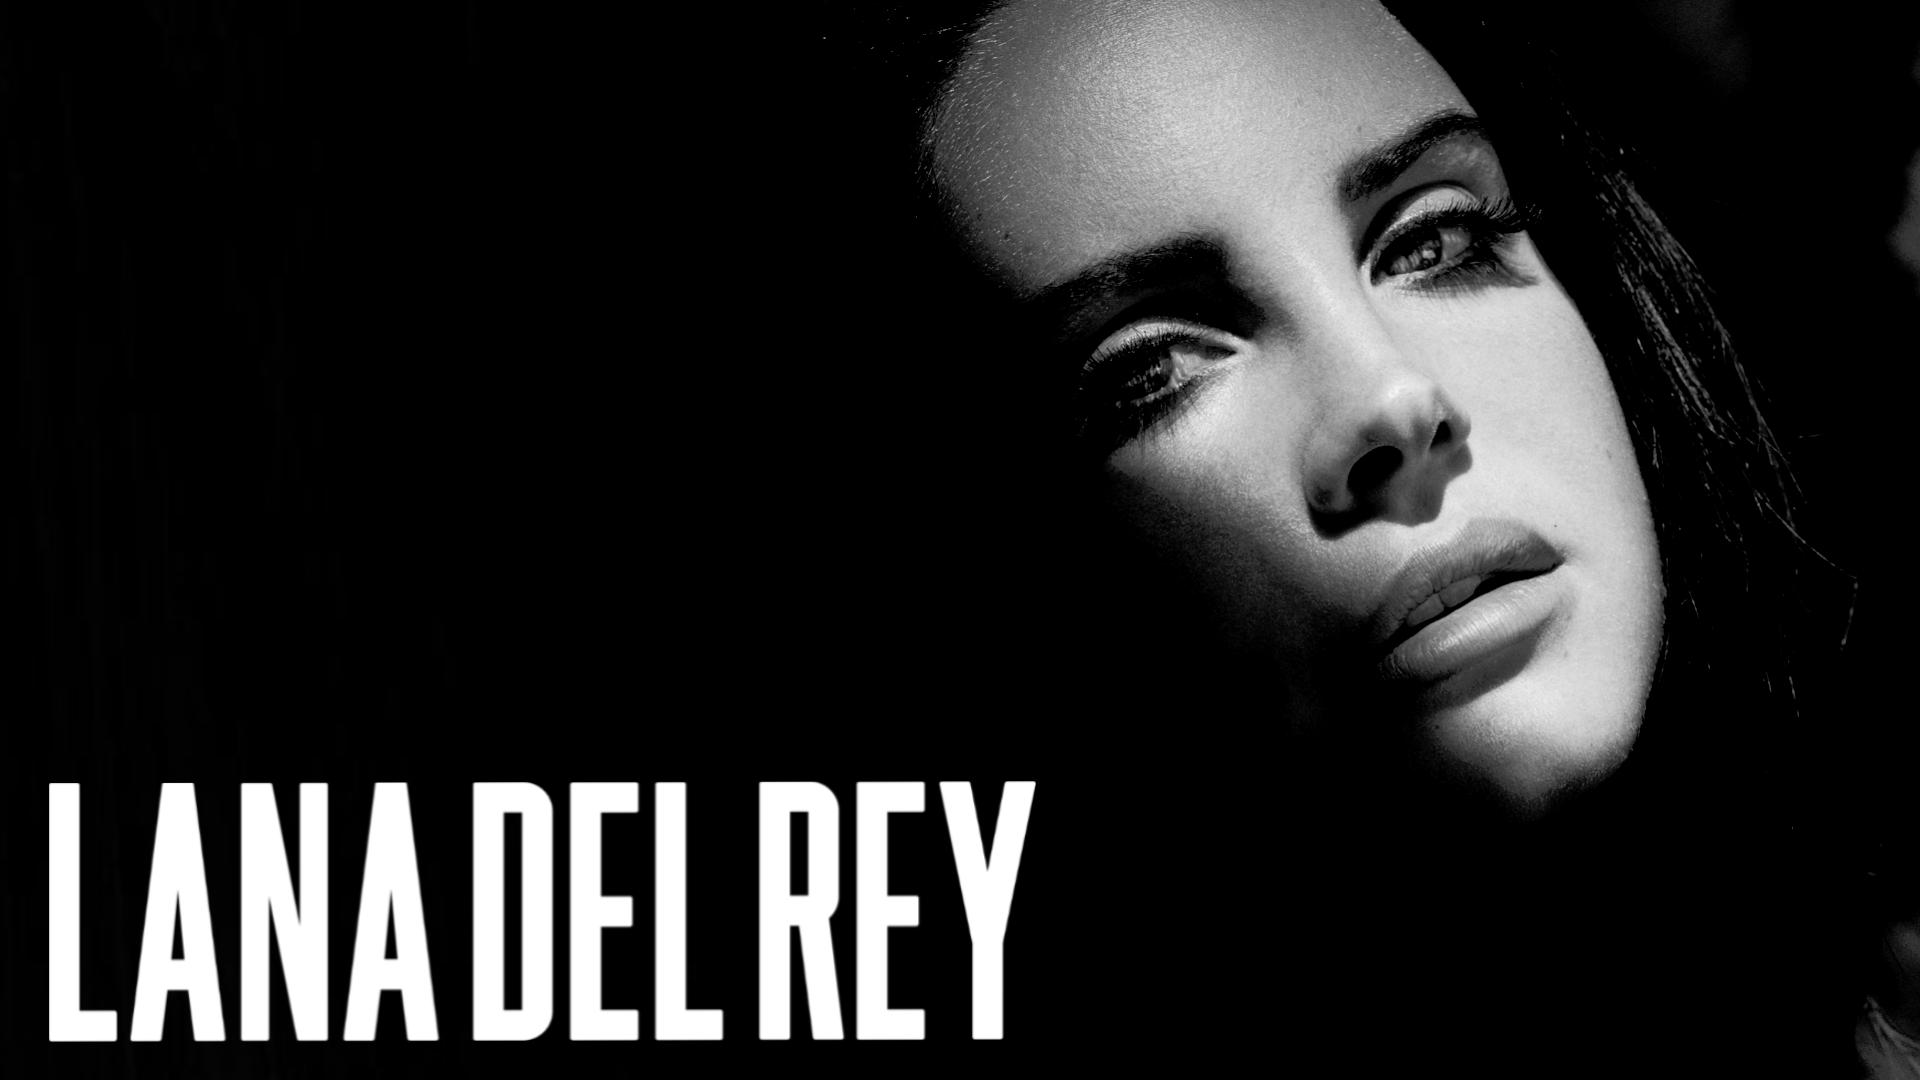 Lana Del Rey Wallpaper 2 HD by Nush-F on DeviantArt